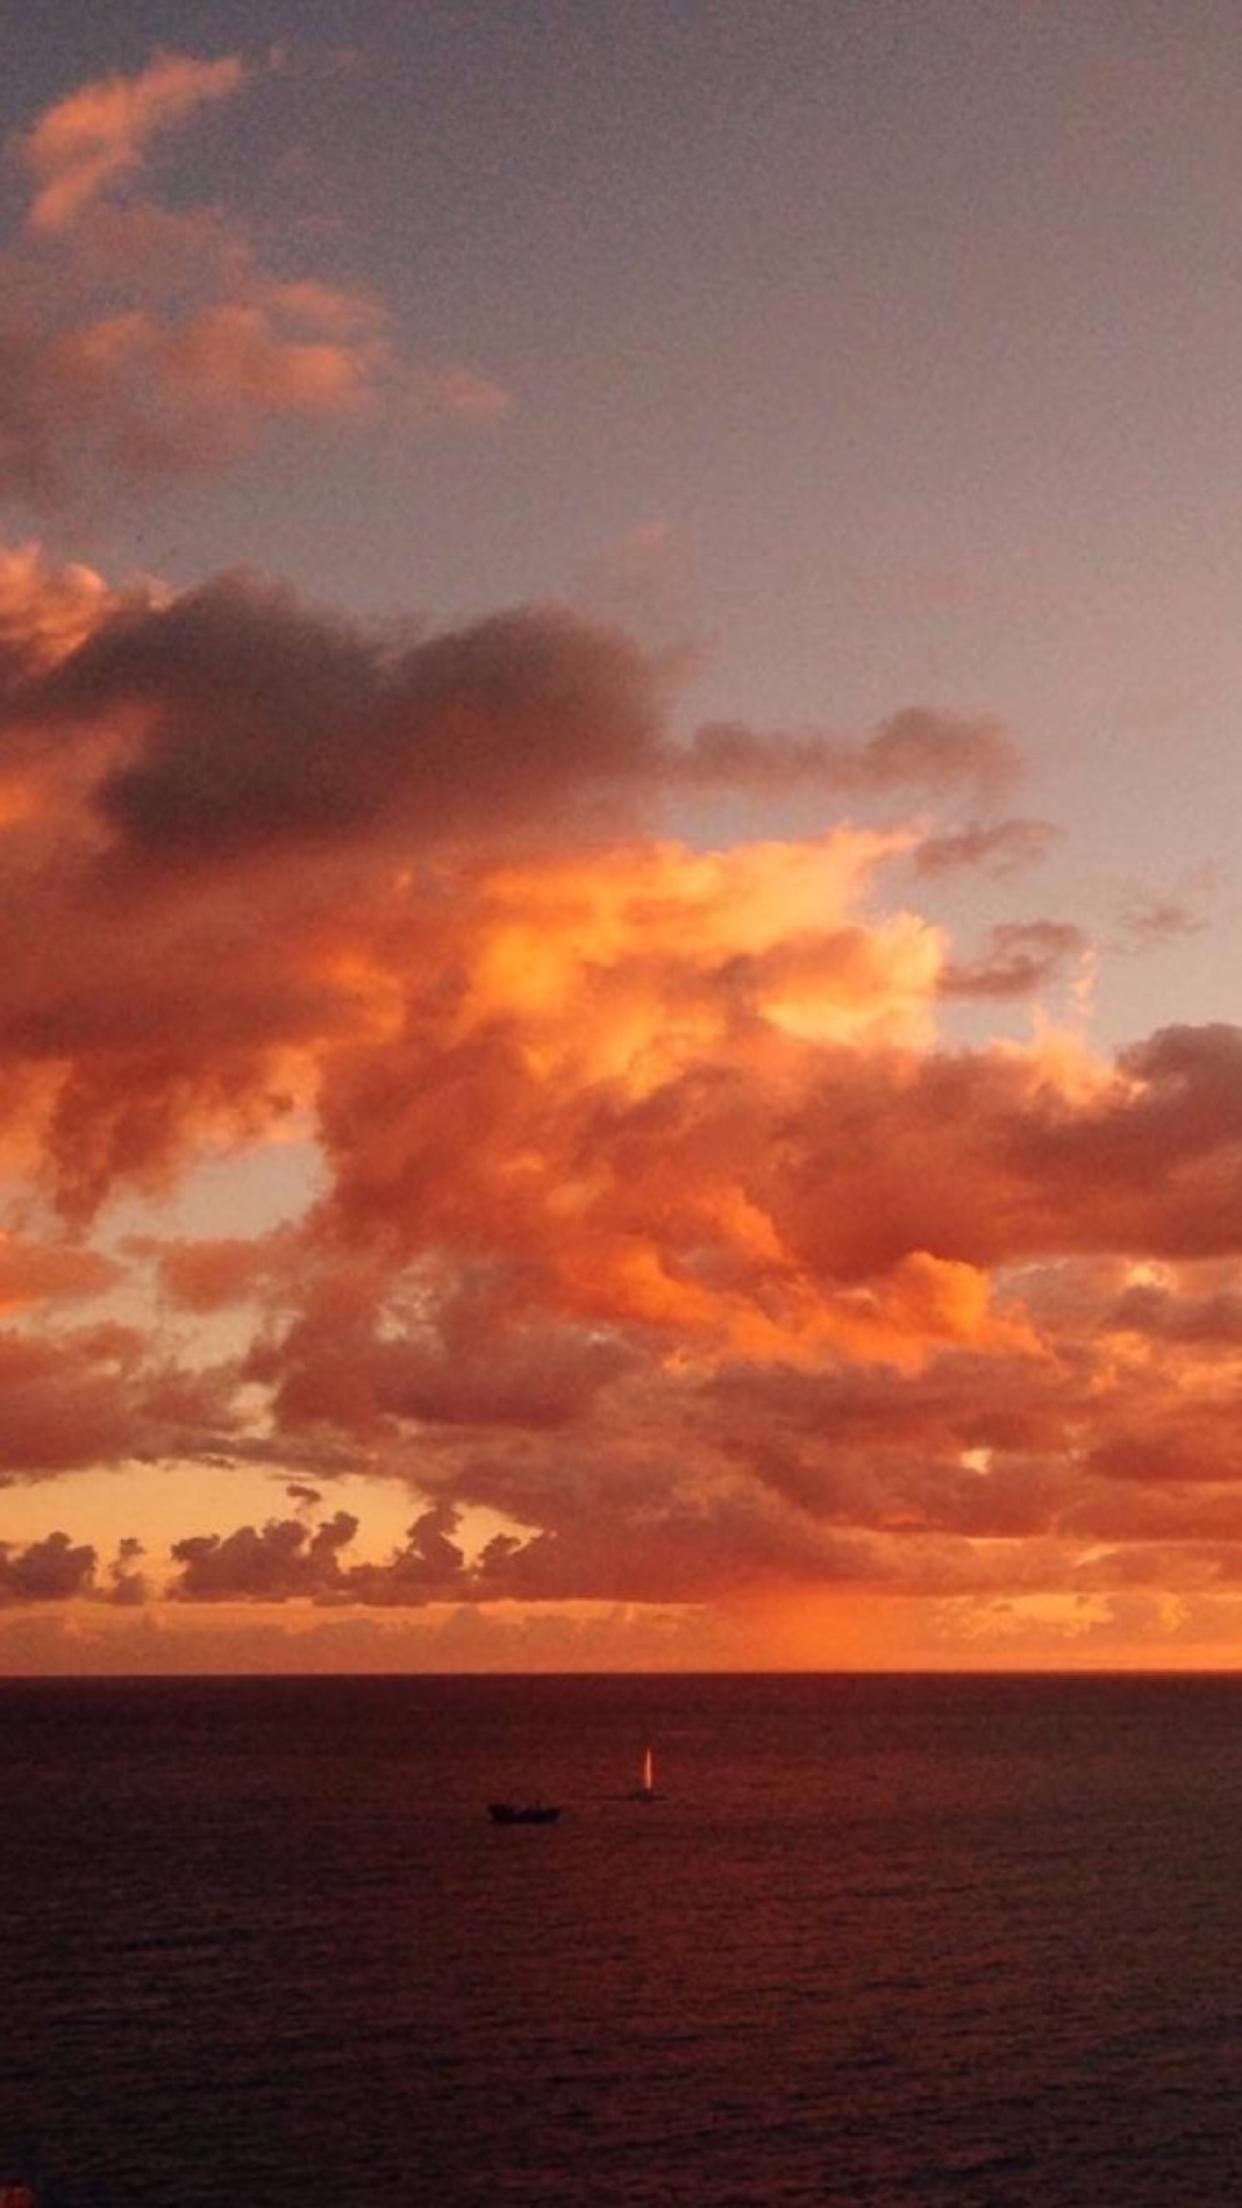 Pin by Kayrie Gonzalez on Backgrounds Sky aesthetic